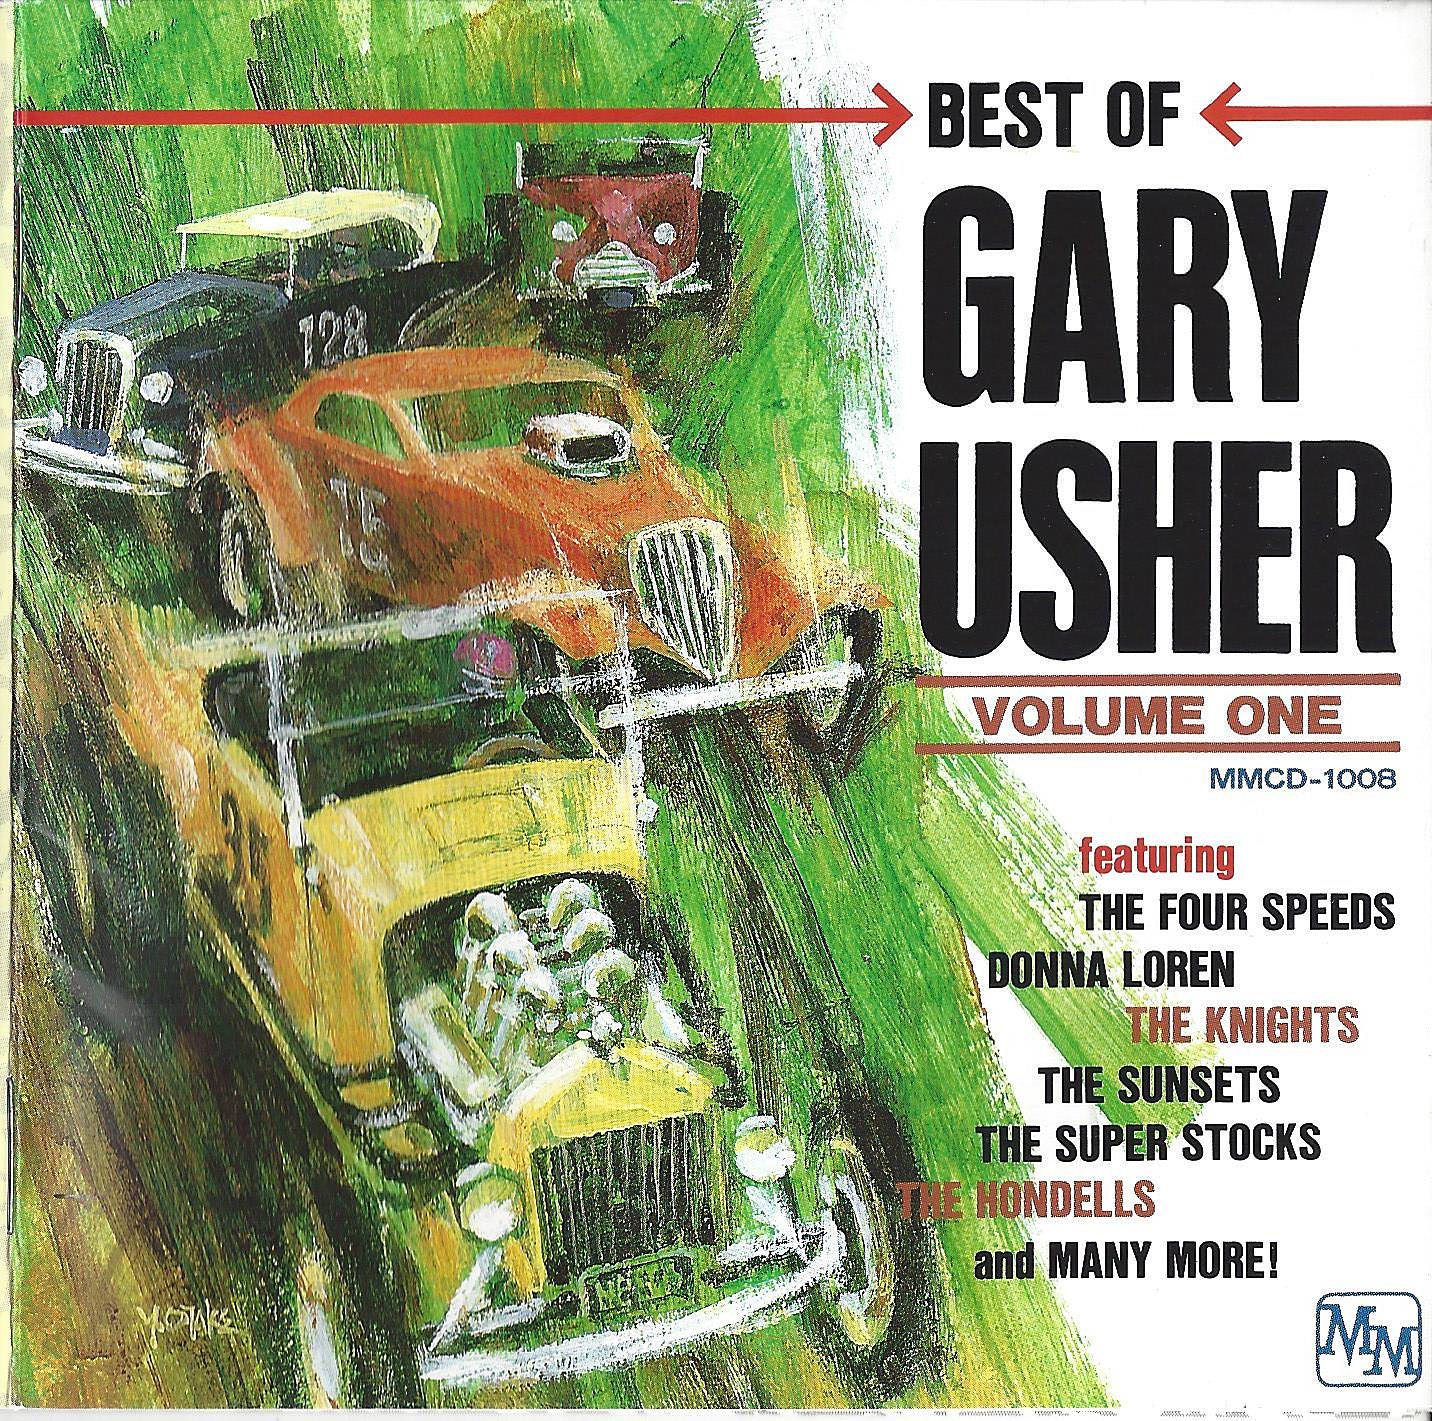 Best Of Gary Usher Volume One cover